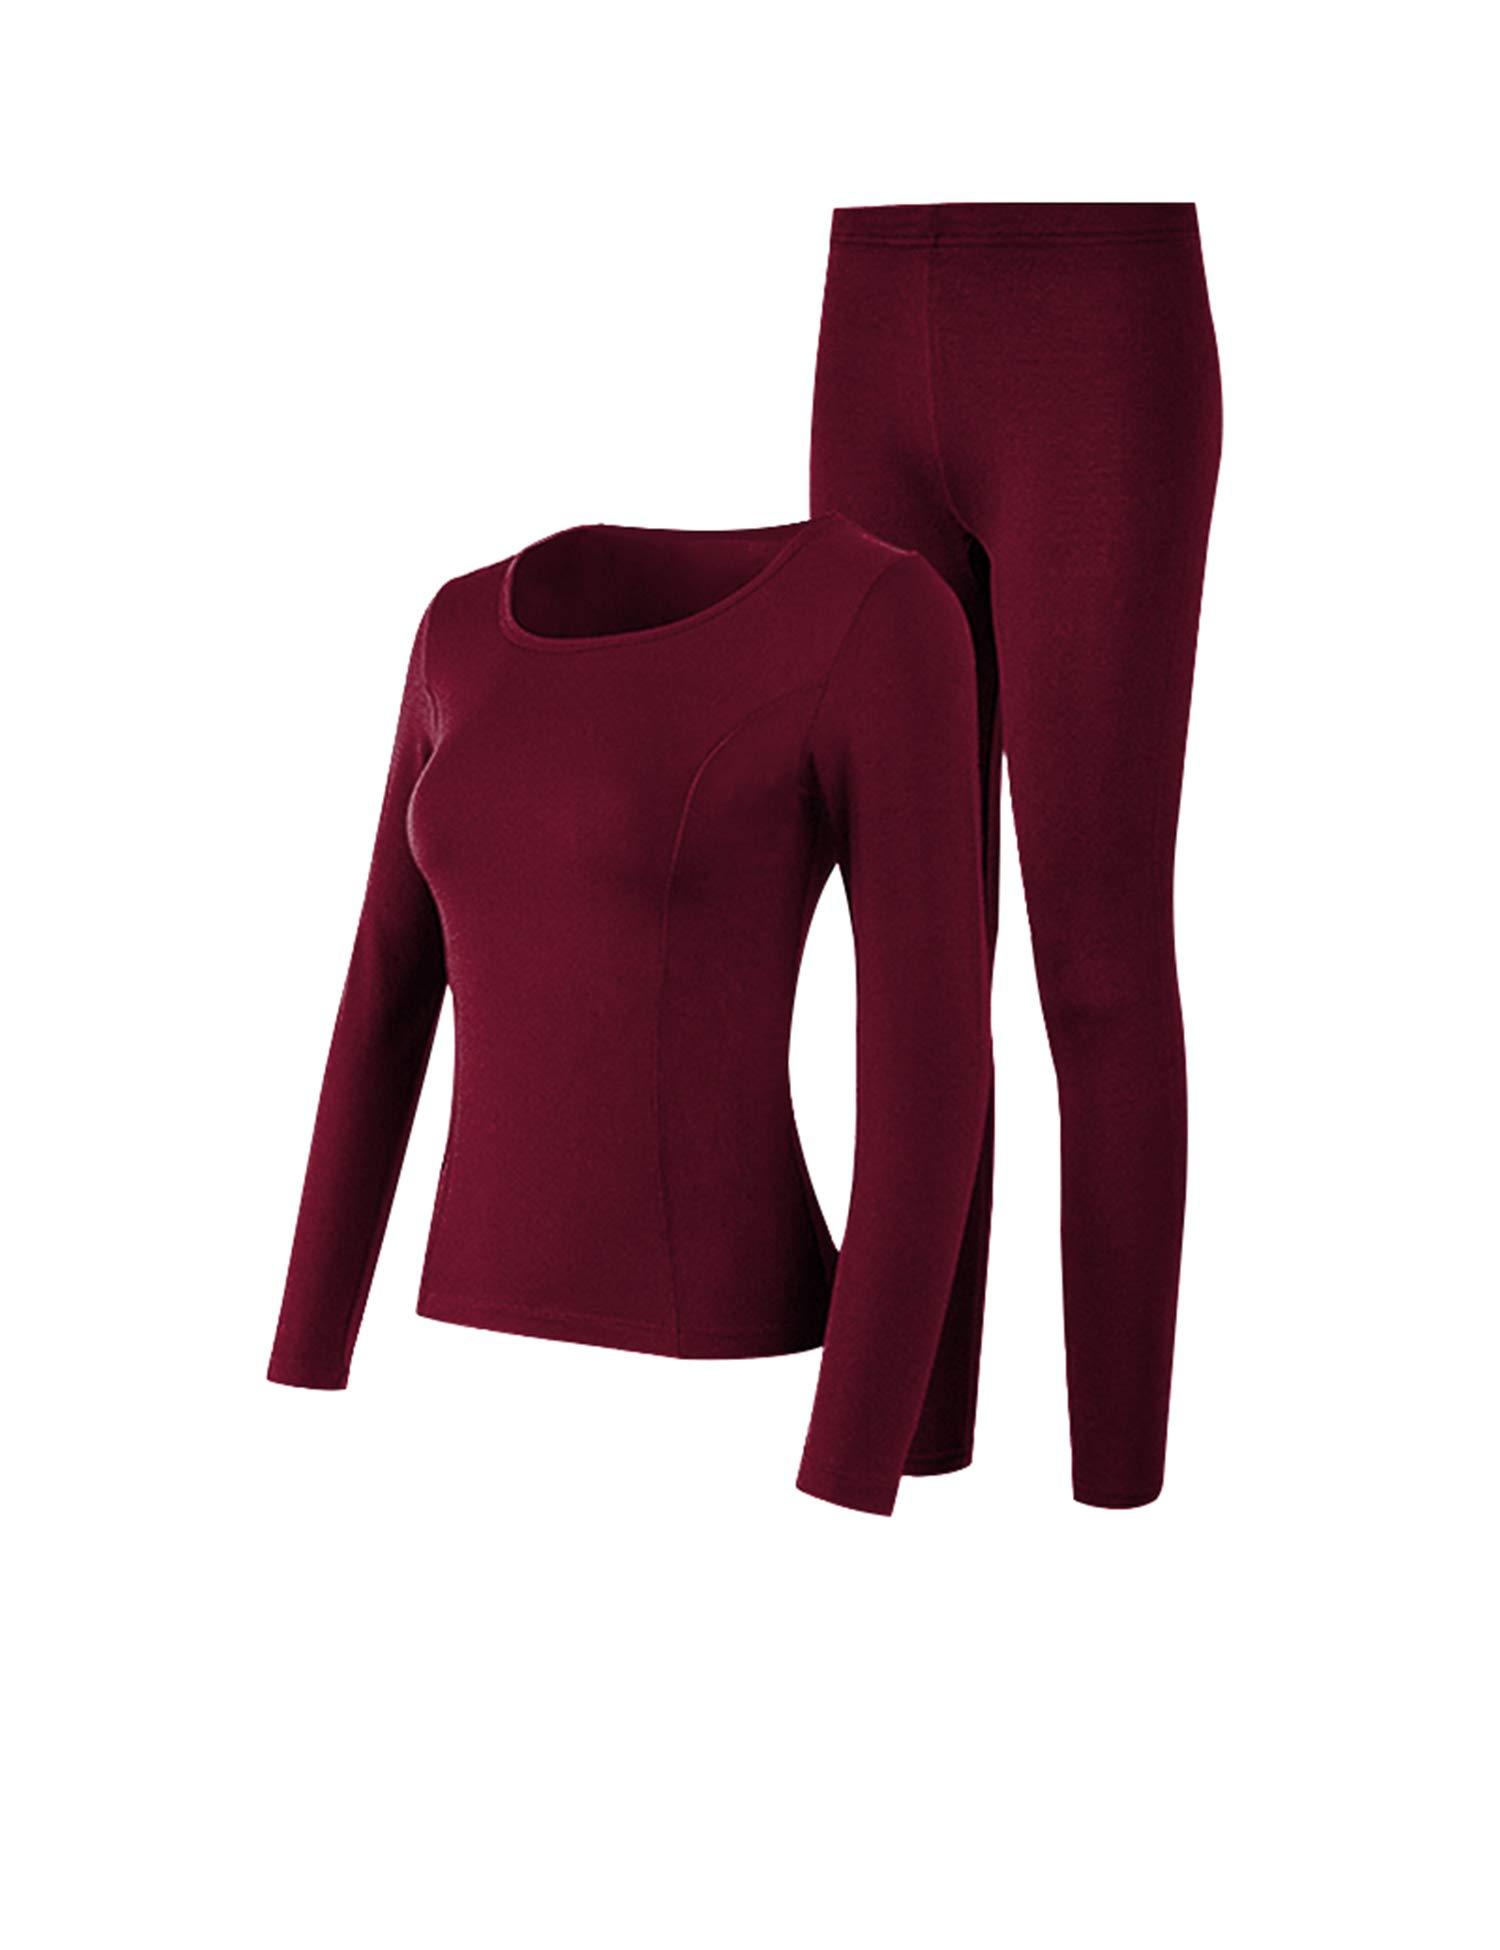 COLORFULLEAF Womens Thermal Underwear Set Cotton Long Johns Base Layer Top /& Bottom Pajama